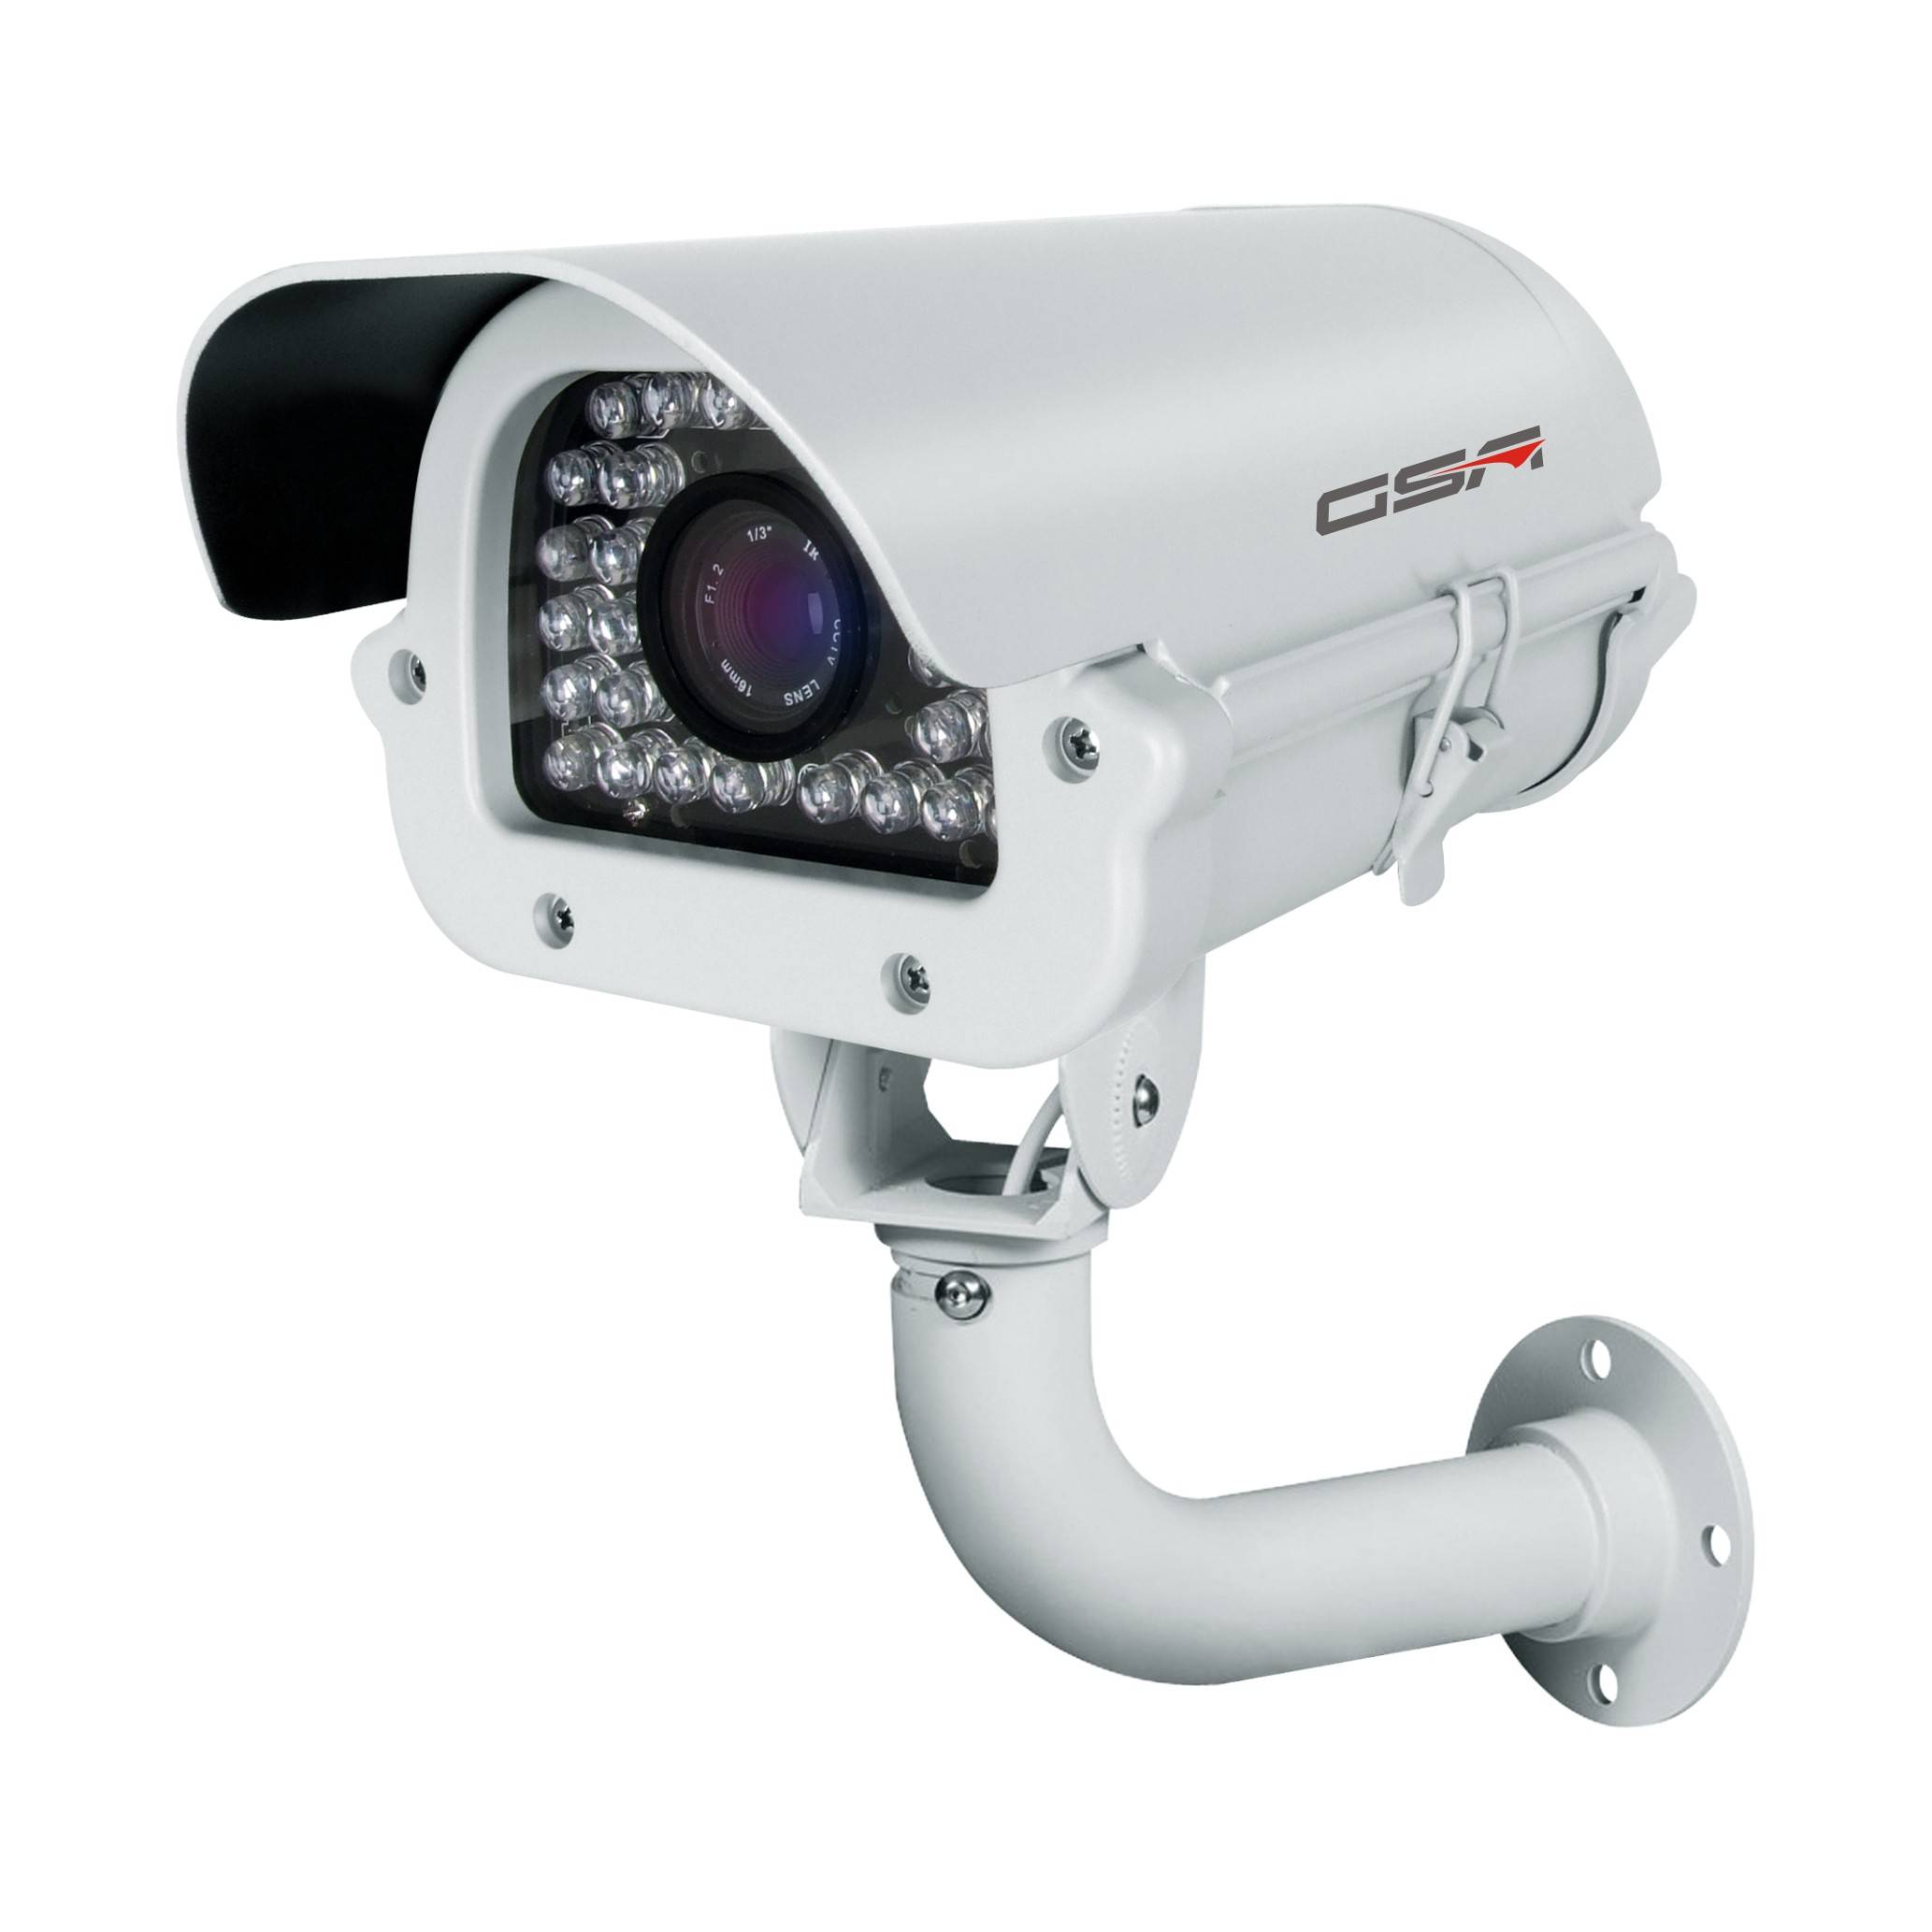 GSA CCTV Camera Supplier from China